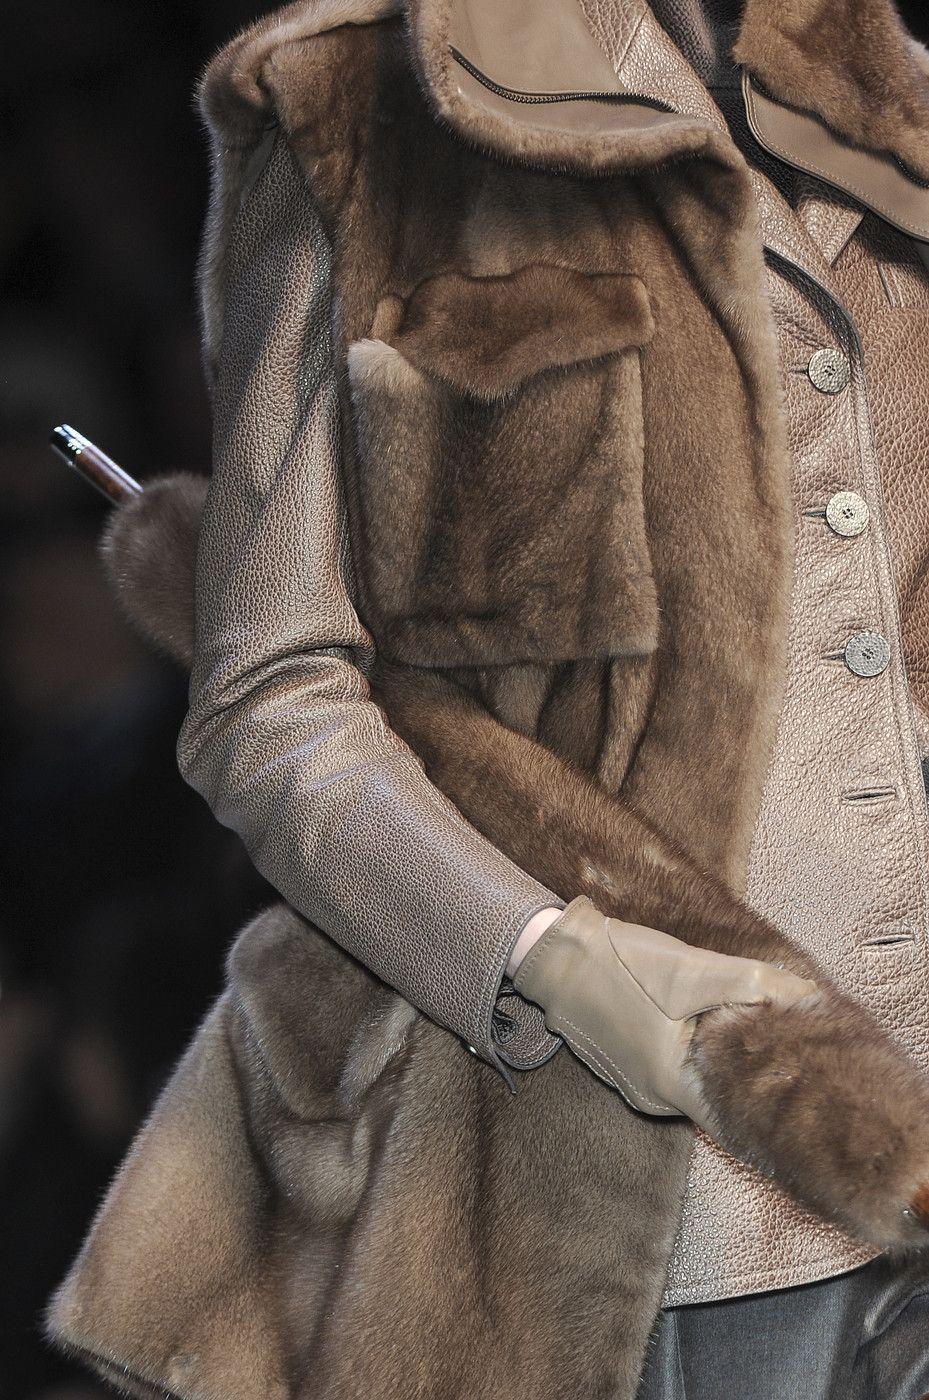 Chanel Resort - Chanel Resort    Chanel Resort   - #ArmaniPrive #Balmain #Chanel #ChanelResort #ChanelSpring #CoutureCollection #DubaiFashion #EmilioPucci #FashionShow #FashionWeeks #GiambattistaValli #JeanPaulGaultier #JulienMacdonald #ReadyToWear #Resort #RobertoCavalli #Runway #RunwayFashion #SpringCouture #Valentino #Versace #Vogue #ZacPosen